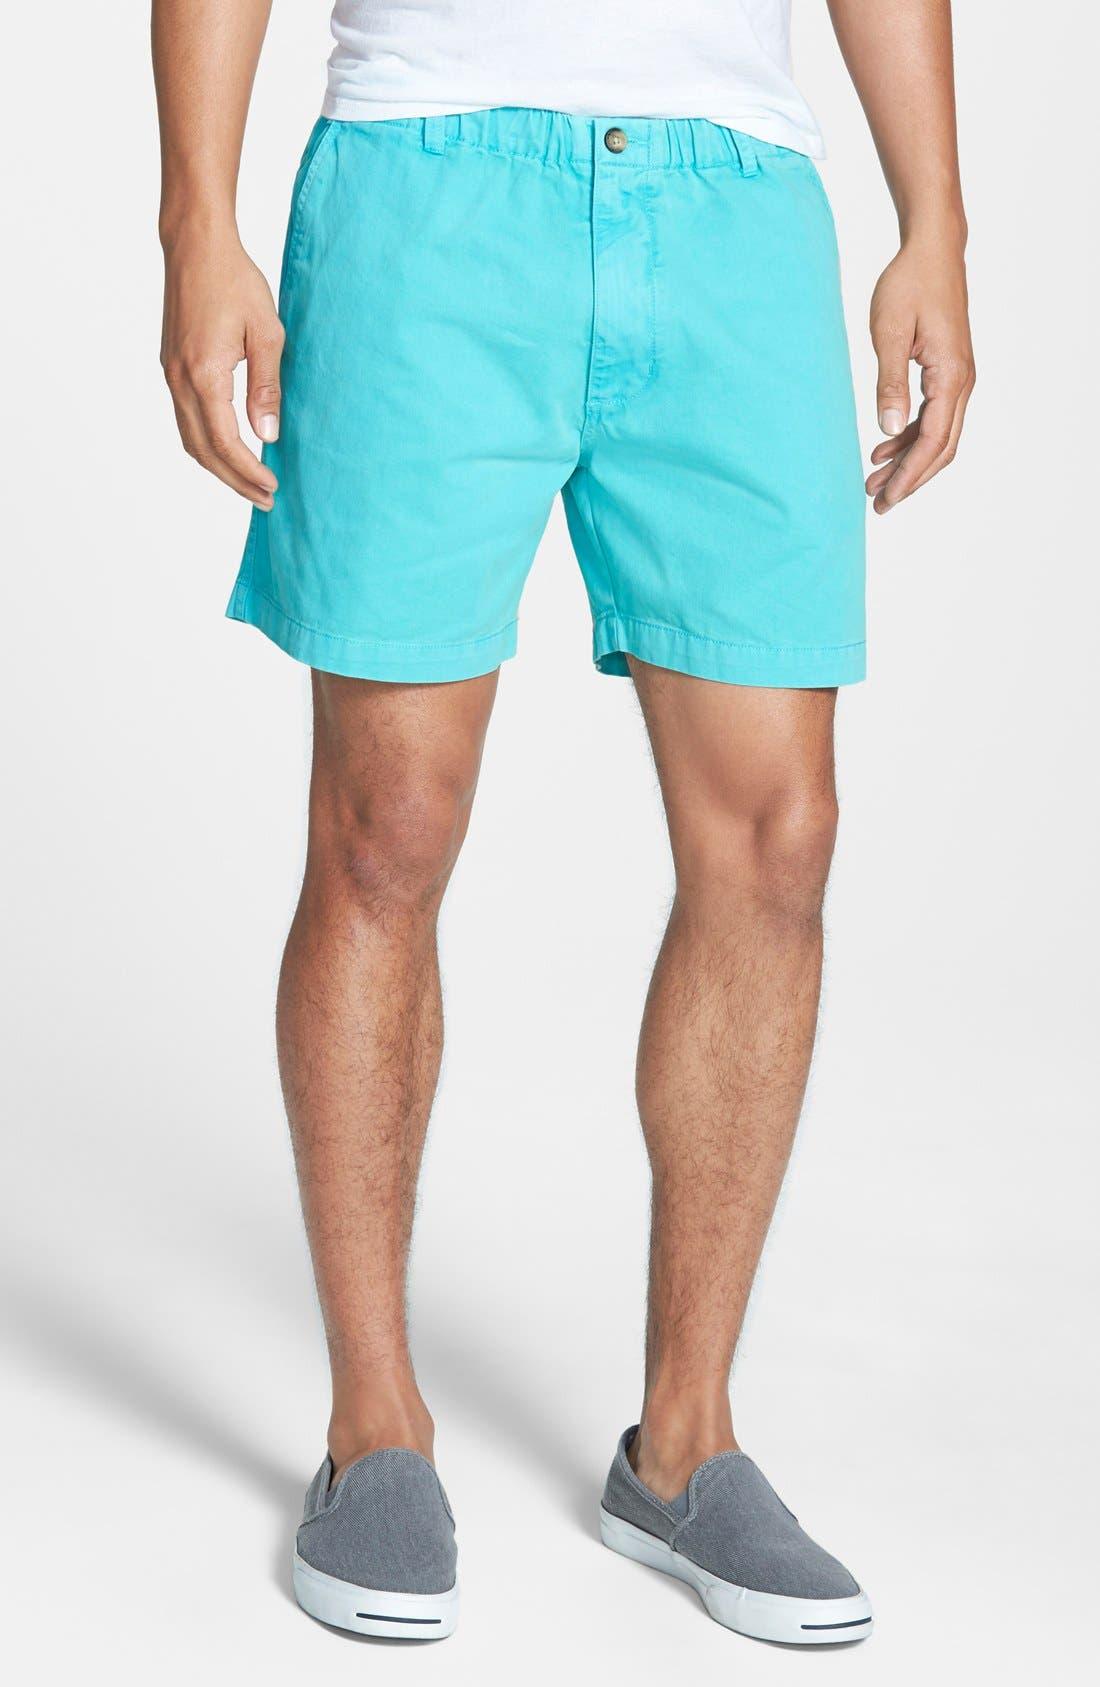 'Snappers' Vintage Wash Shorts,                         Main,                         color, Caribbean Blue